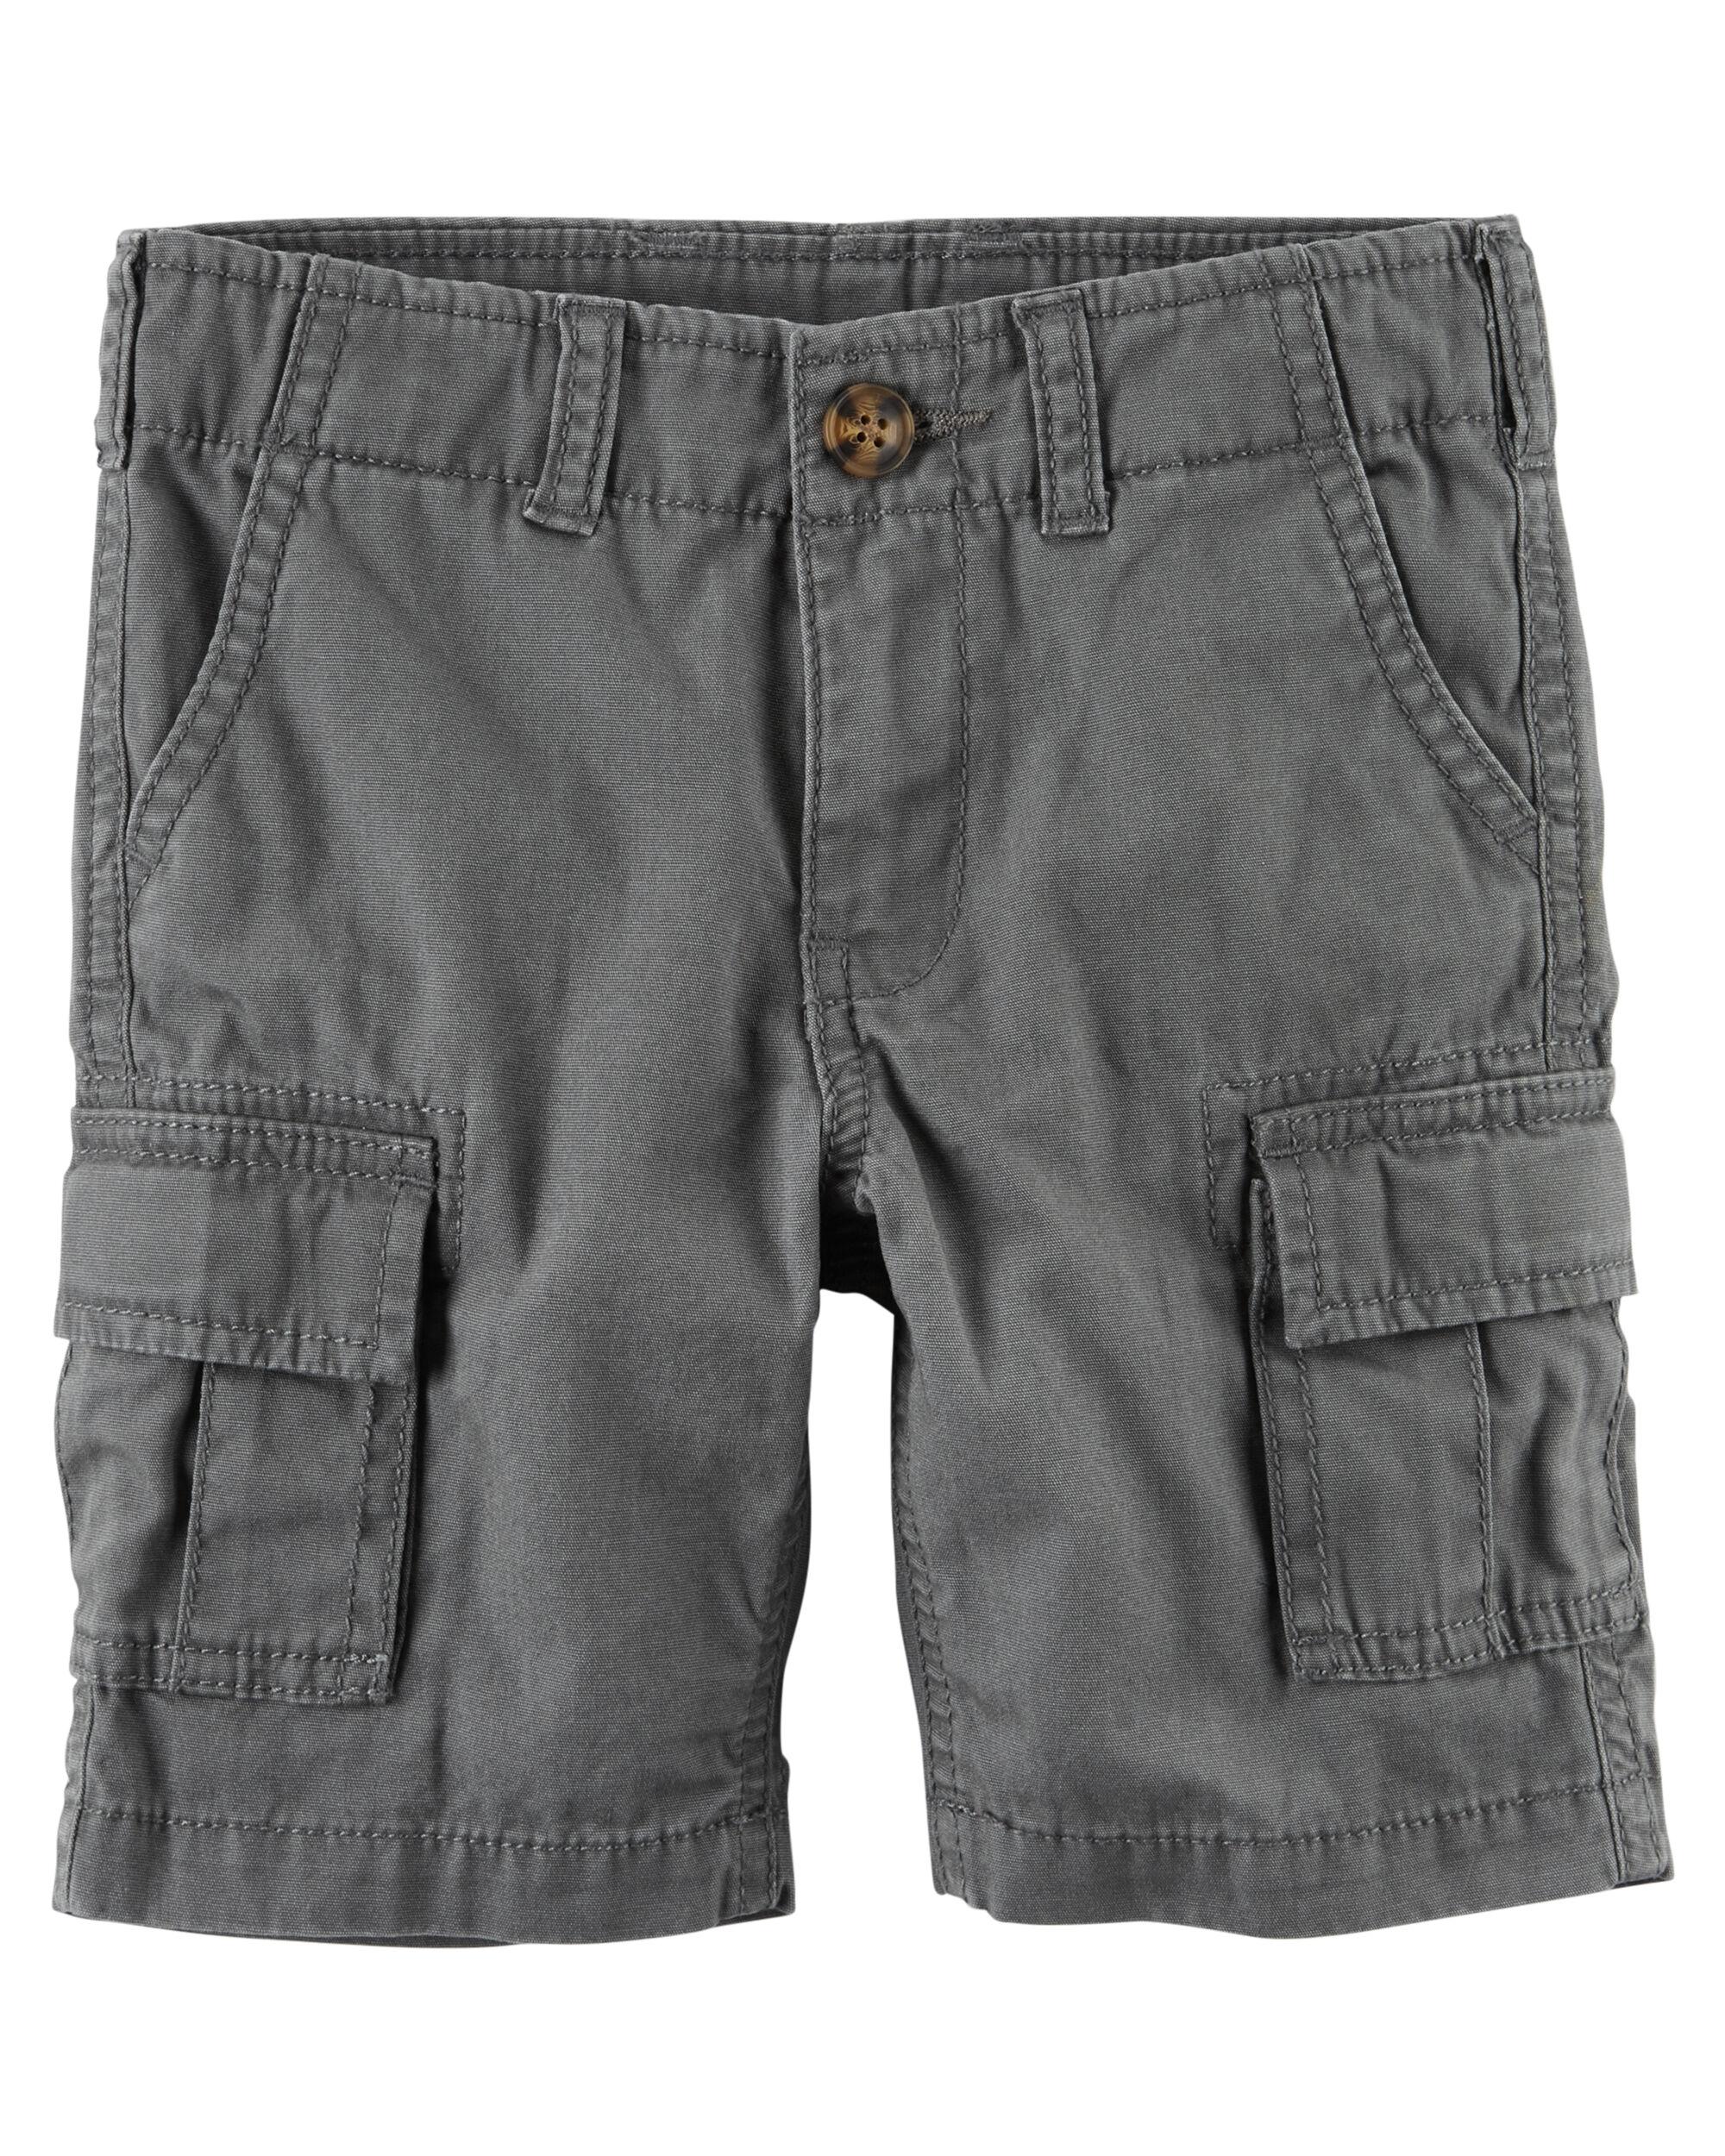 Carters Boys Canvas Cargo Shorts Grey 9m